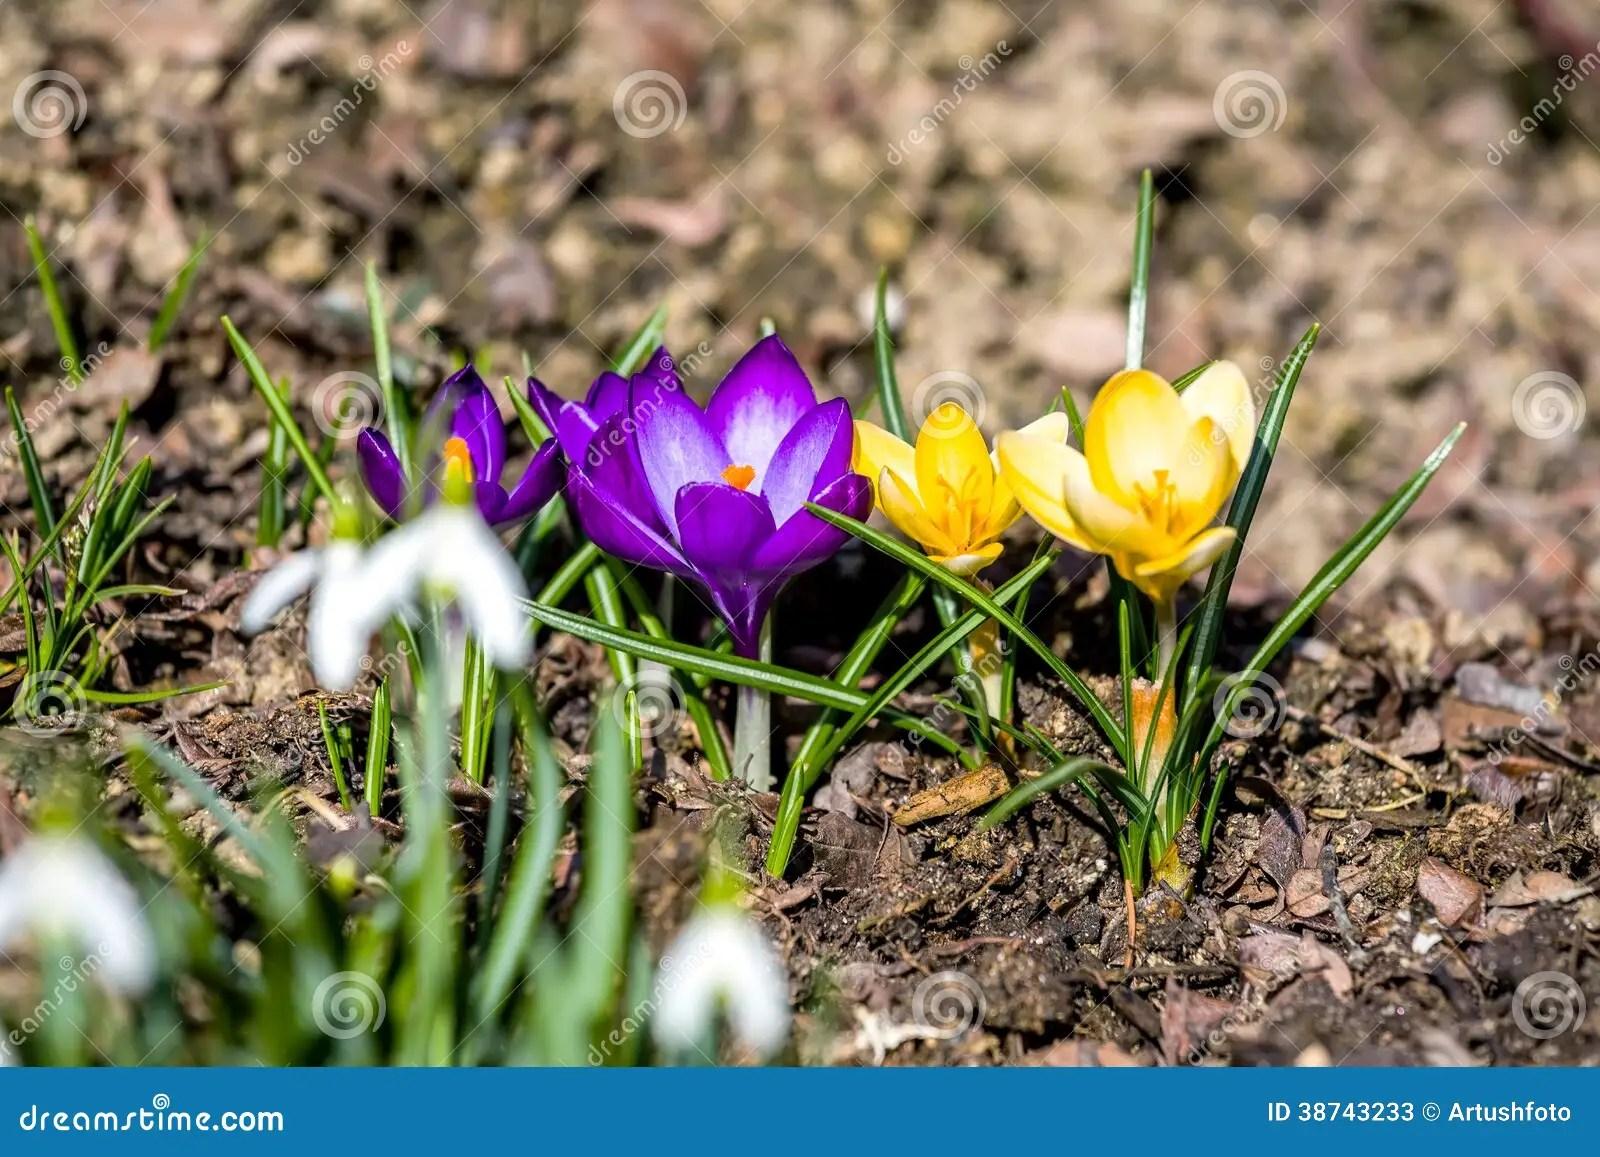 Fruhlingsblumen Garten Fruhlingszweige Als Deko Fur Die Vase Tipps